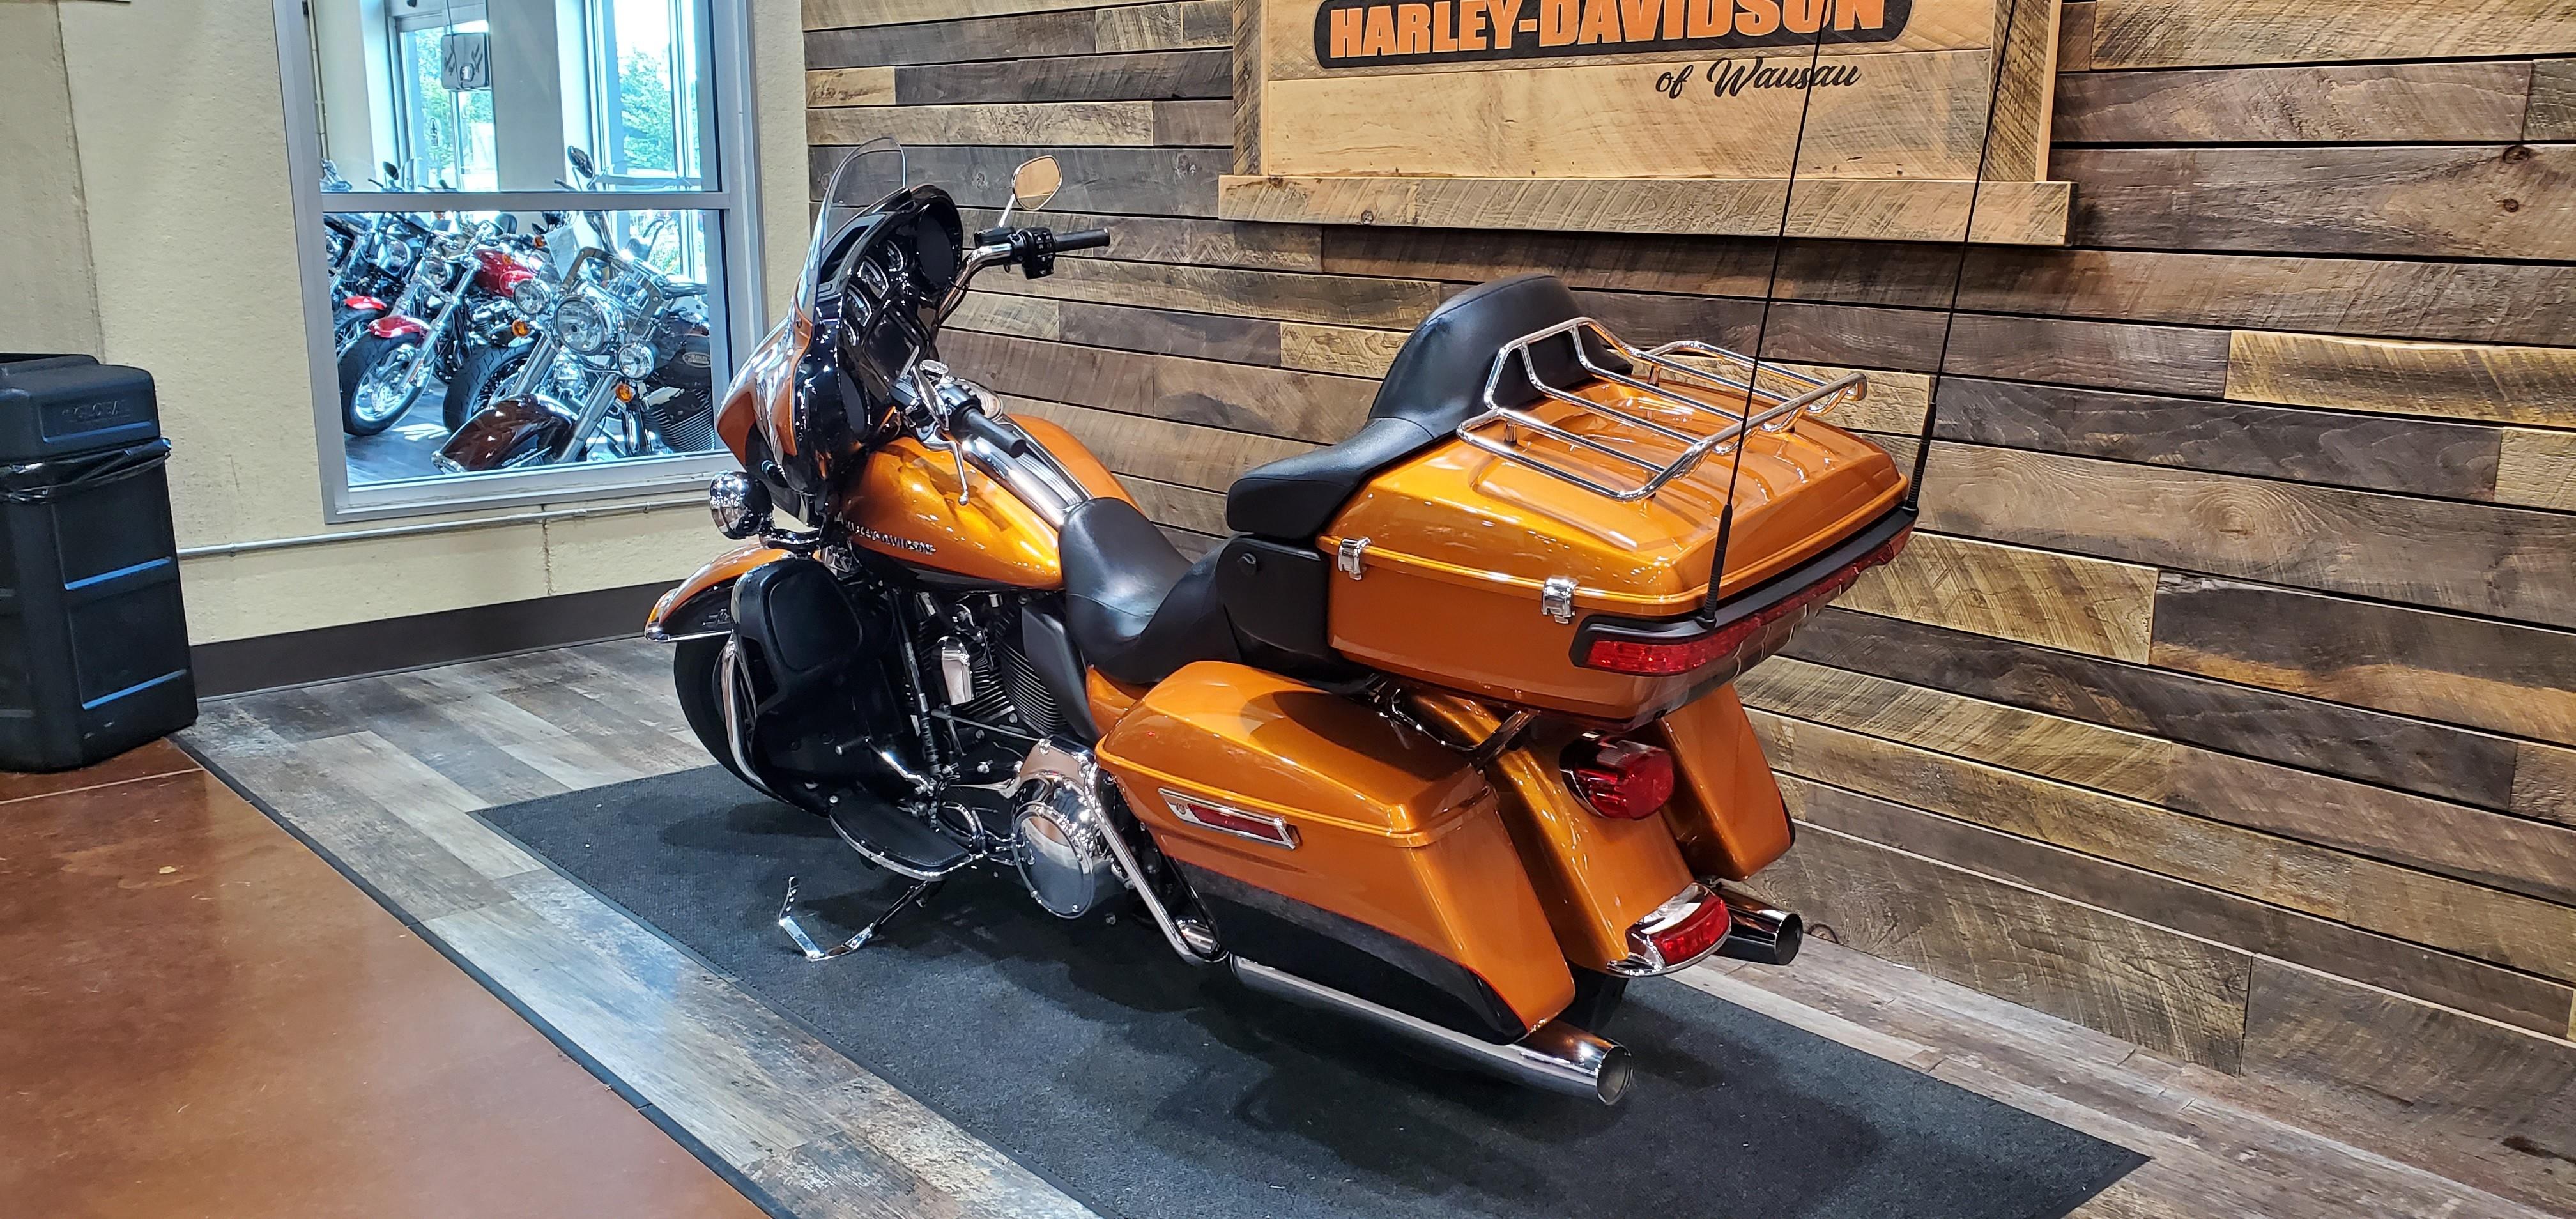 2015 Harley-Davidson Electra Glide Ultra Limited Low at Bull Falls Harley-Davidson